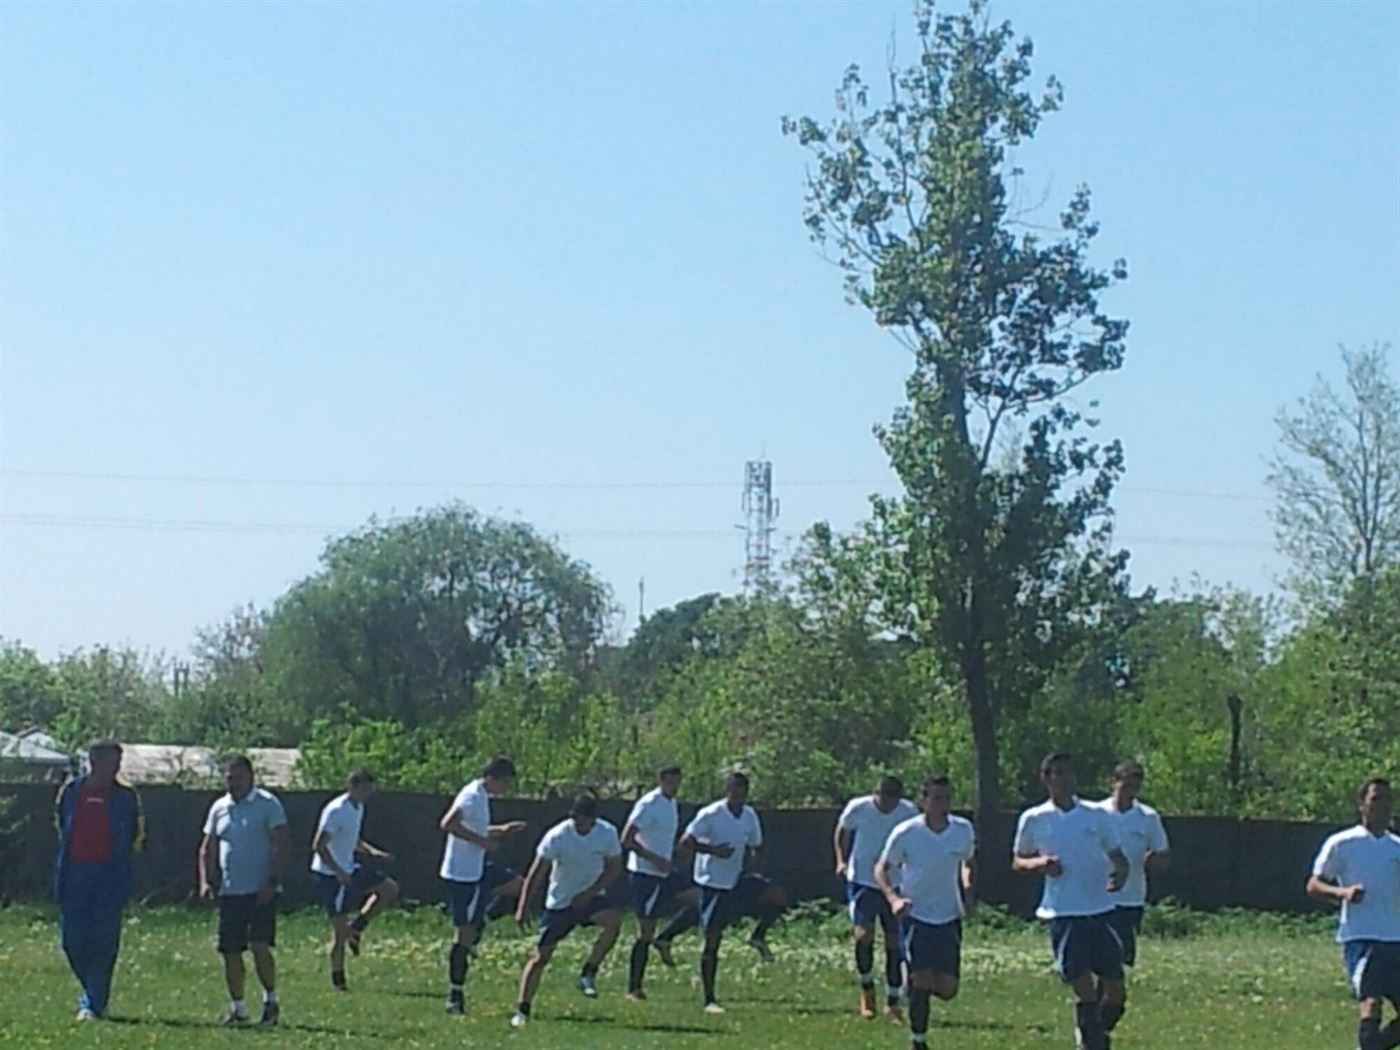 Ciresu, Insuratei, Movila Miresii si echipa arbitrilor s-au calificat in semifinale